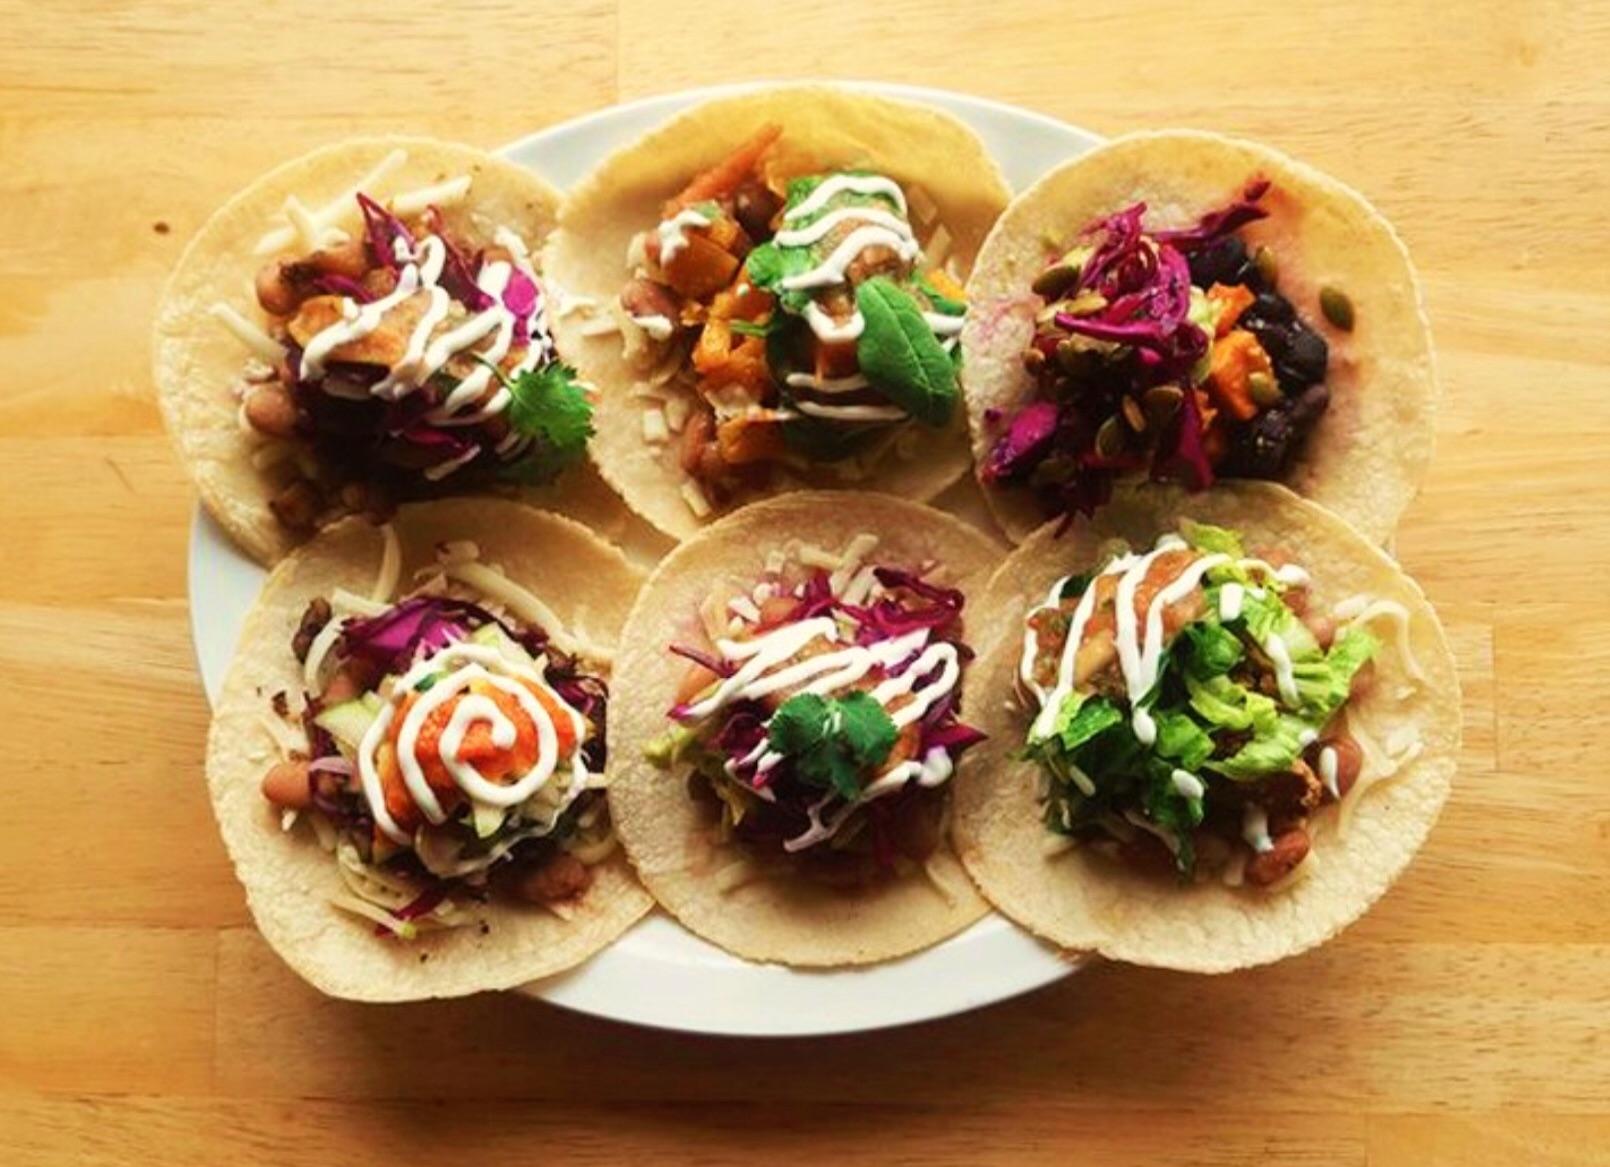 A taco pl;after at Bandidas Taqueria, Commercial Drive